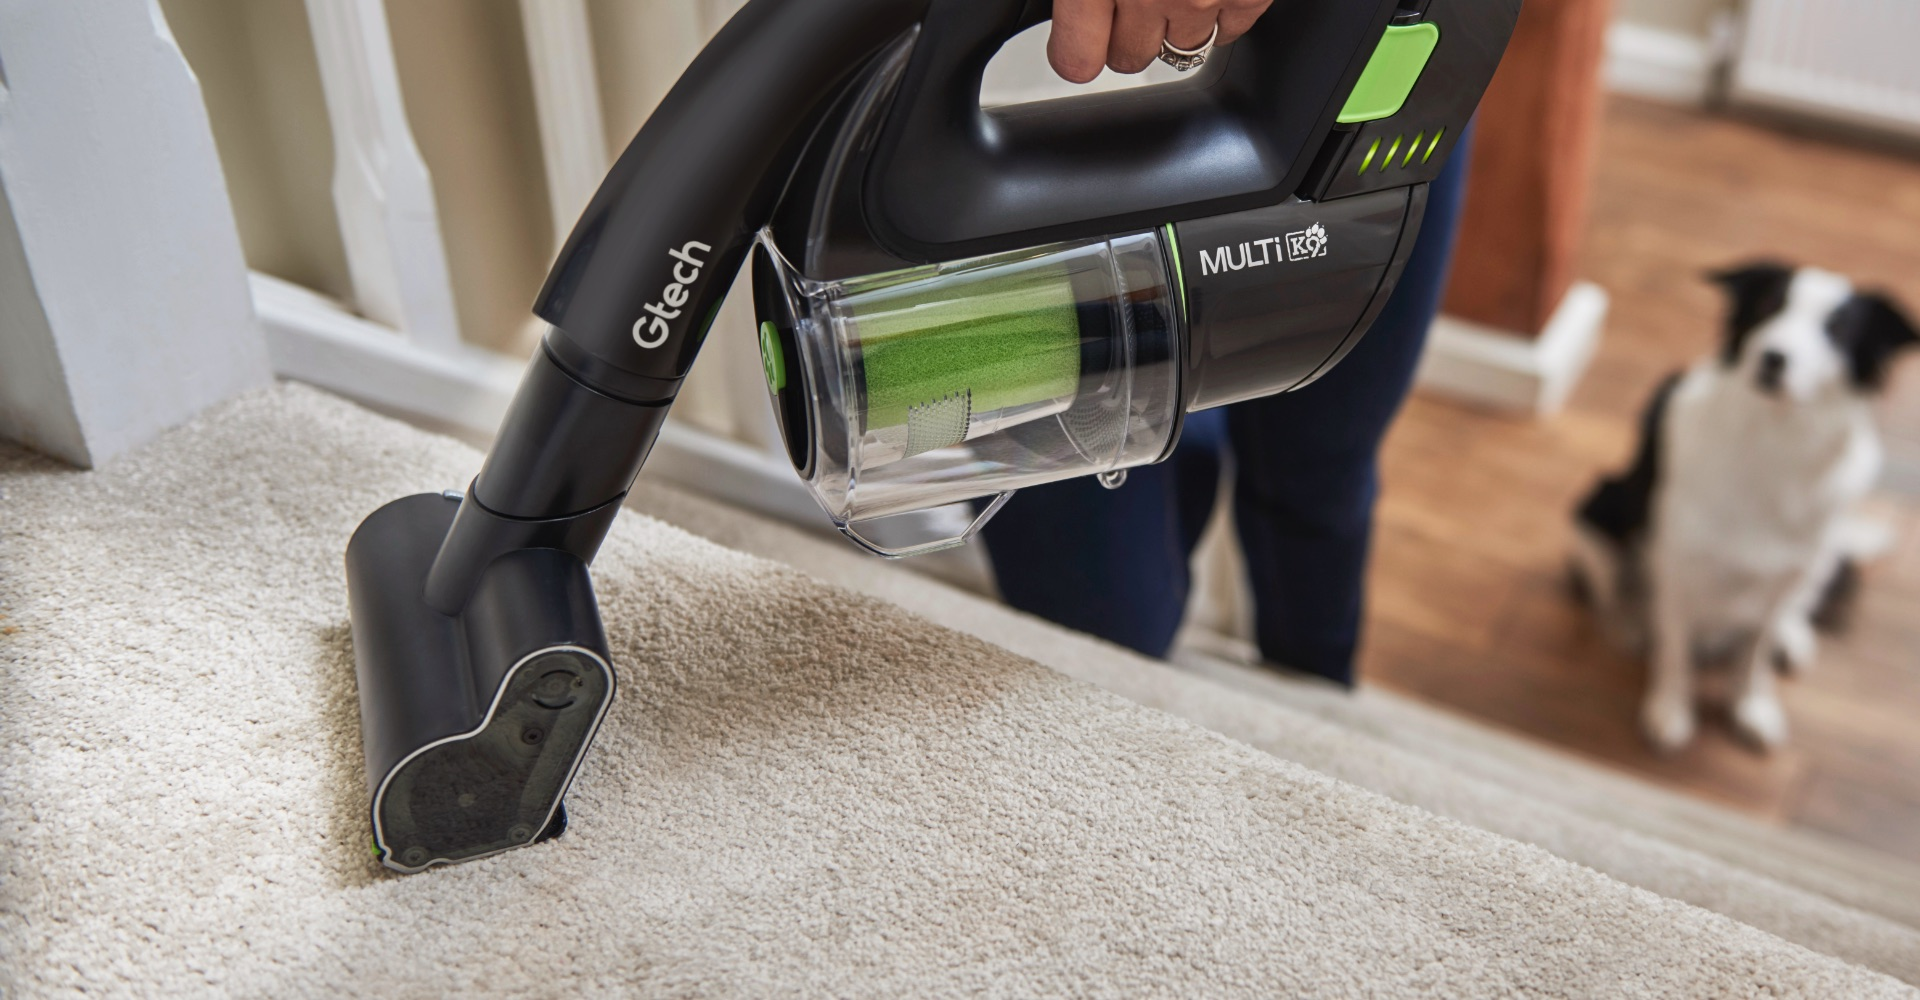 Multi K9 handheld pet vacuum cleaner